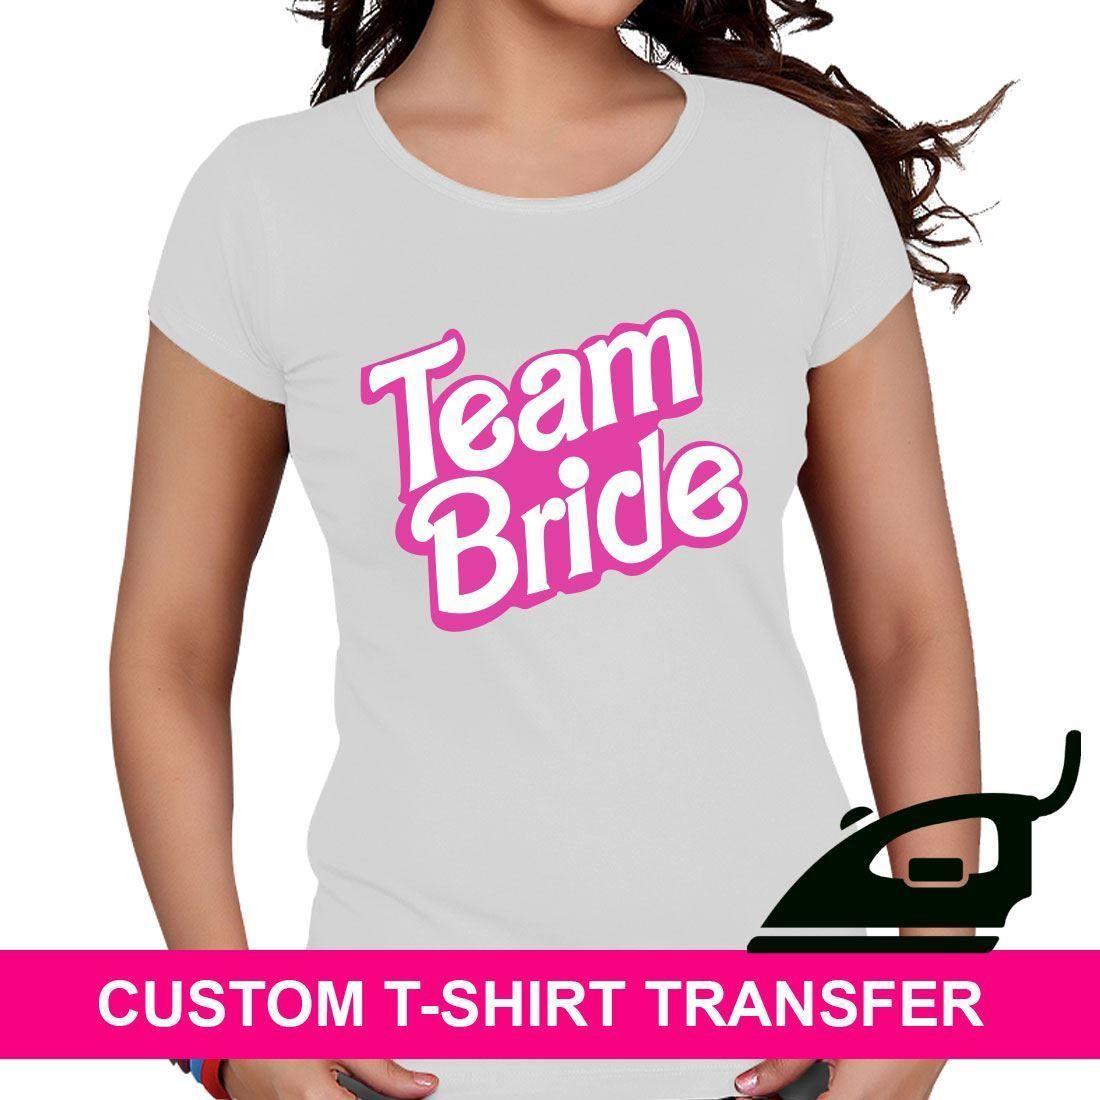 97d9ee16fe3a7 Bride Tribe Hen Night Team Bride Barbie Iron On TShirt Fabric Heat Transfer  Tops